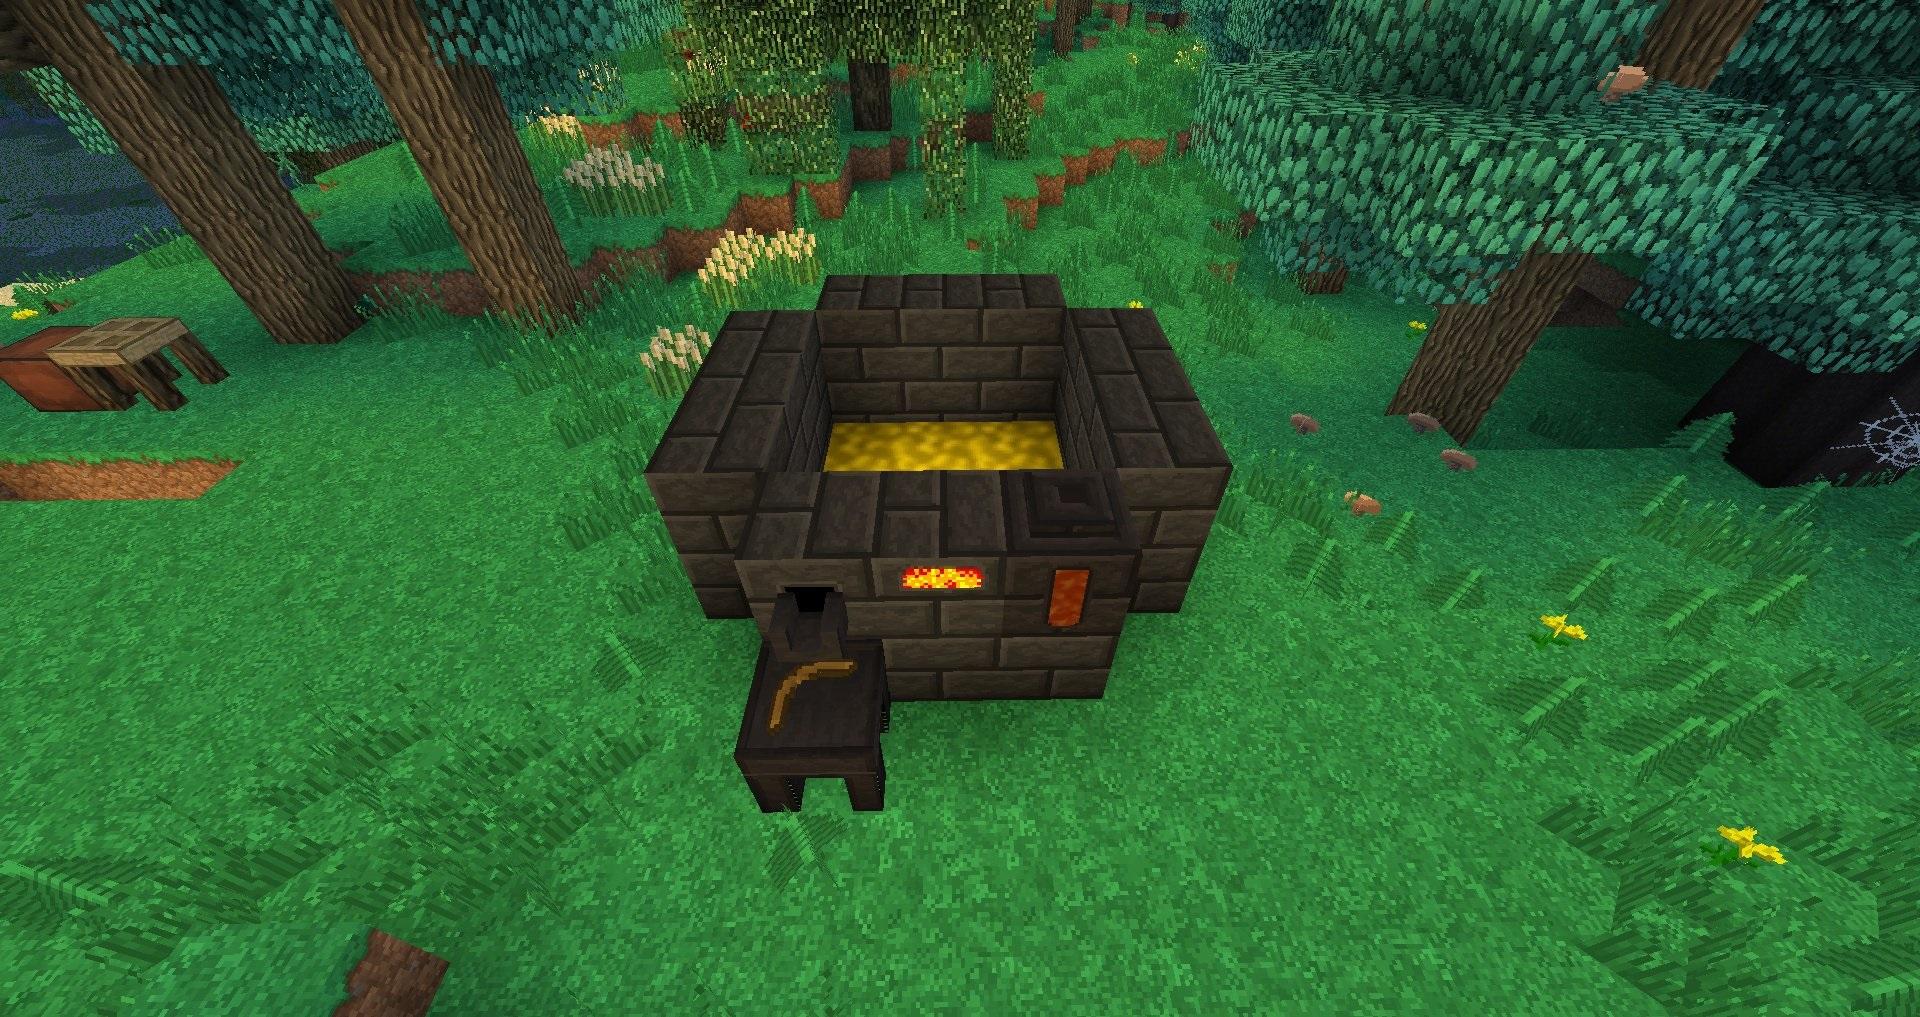 Мод tinkers construct для minecraft 1.8.8/1.7.10/1.7.2/1.6.4